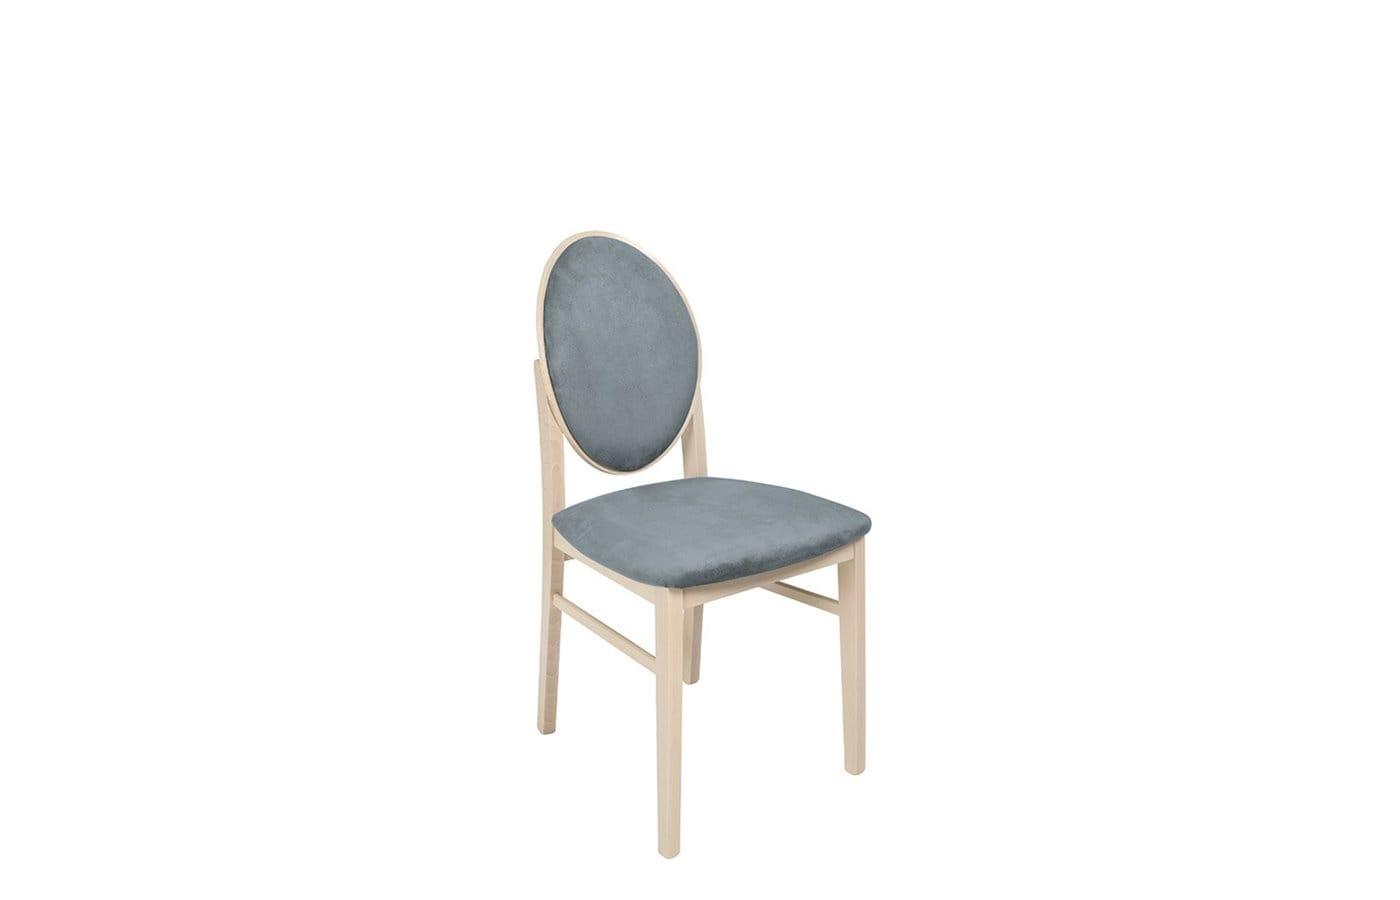 Bernardin krzesło